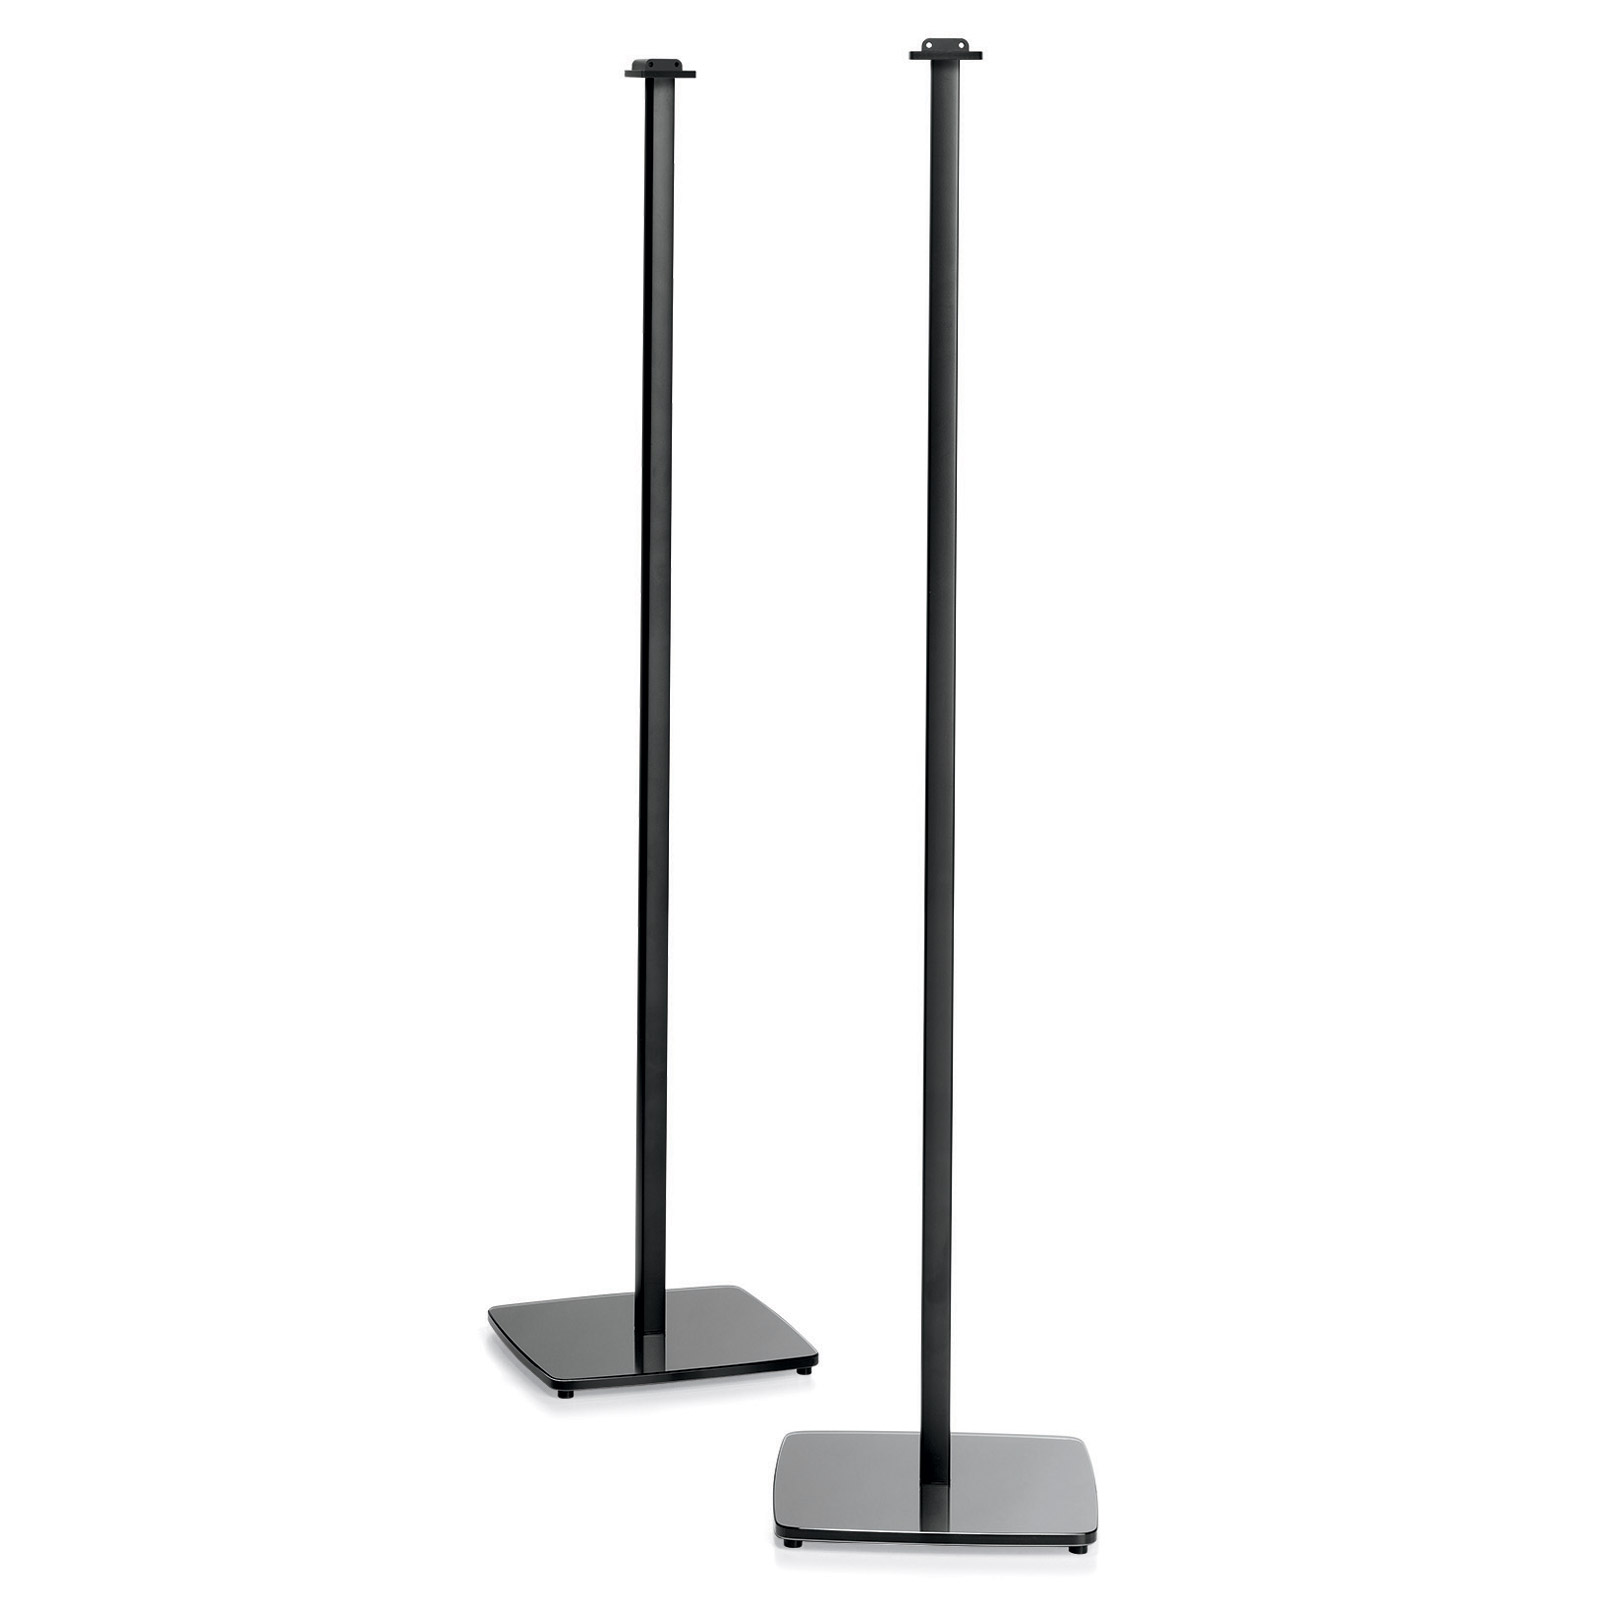 Bose OmniJewel Floor Stand Black Speaker Stands Pair